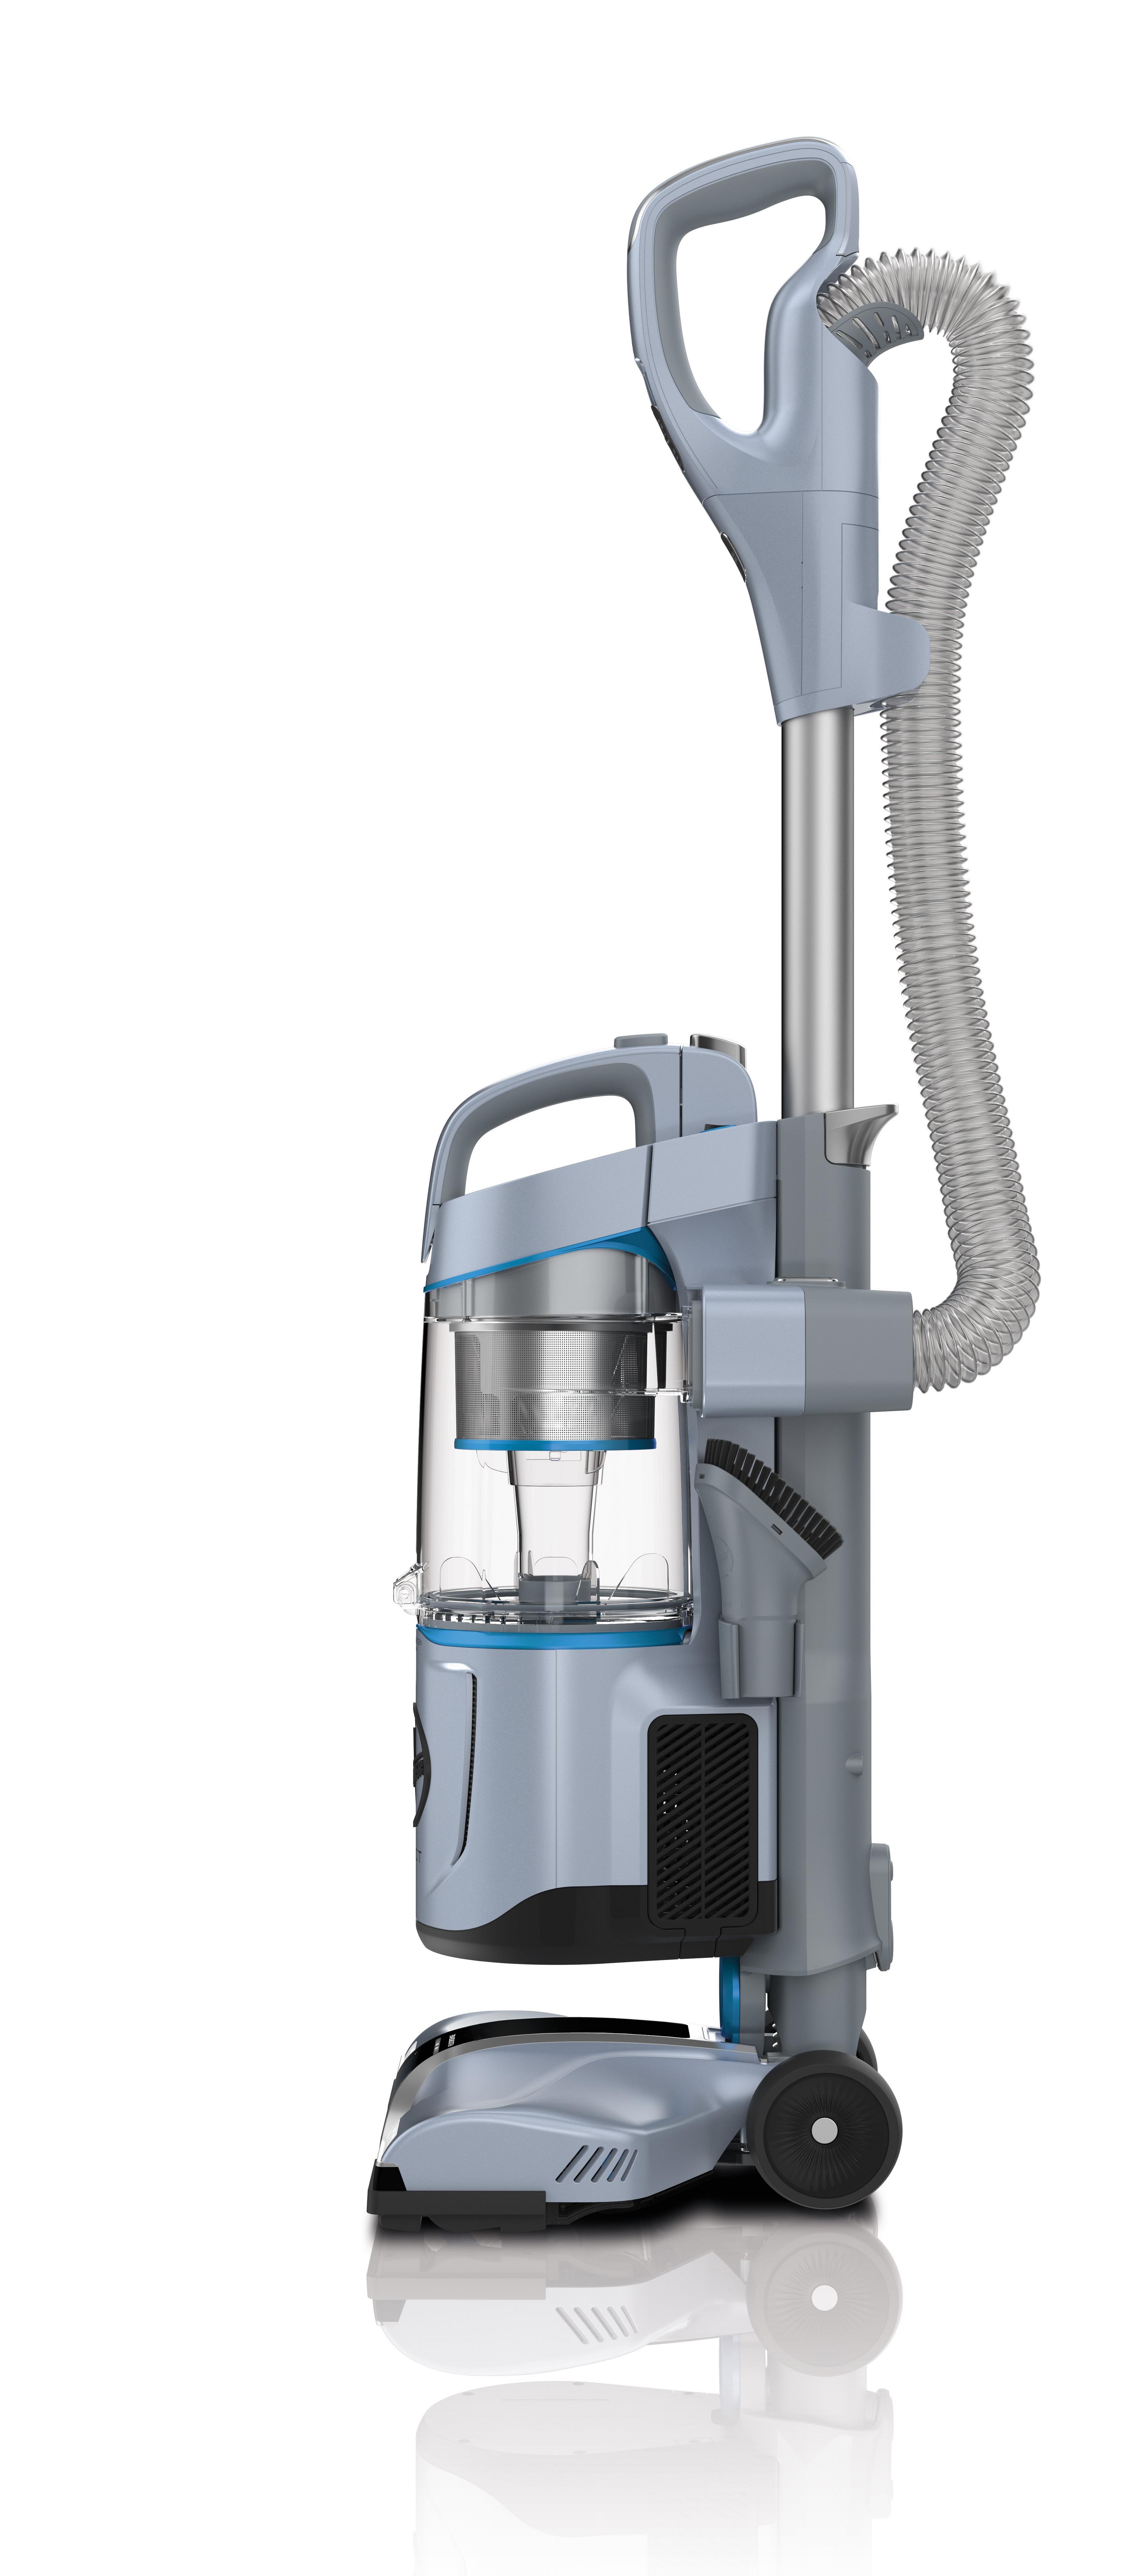 REACT QuickLift Deluxe Upright Vacuum16